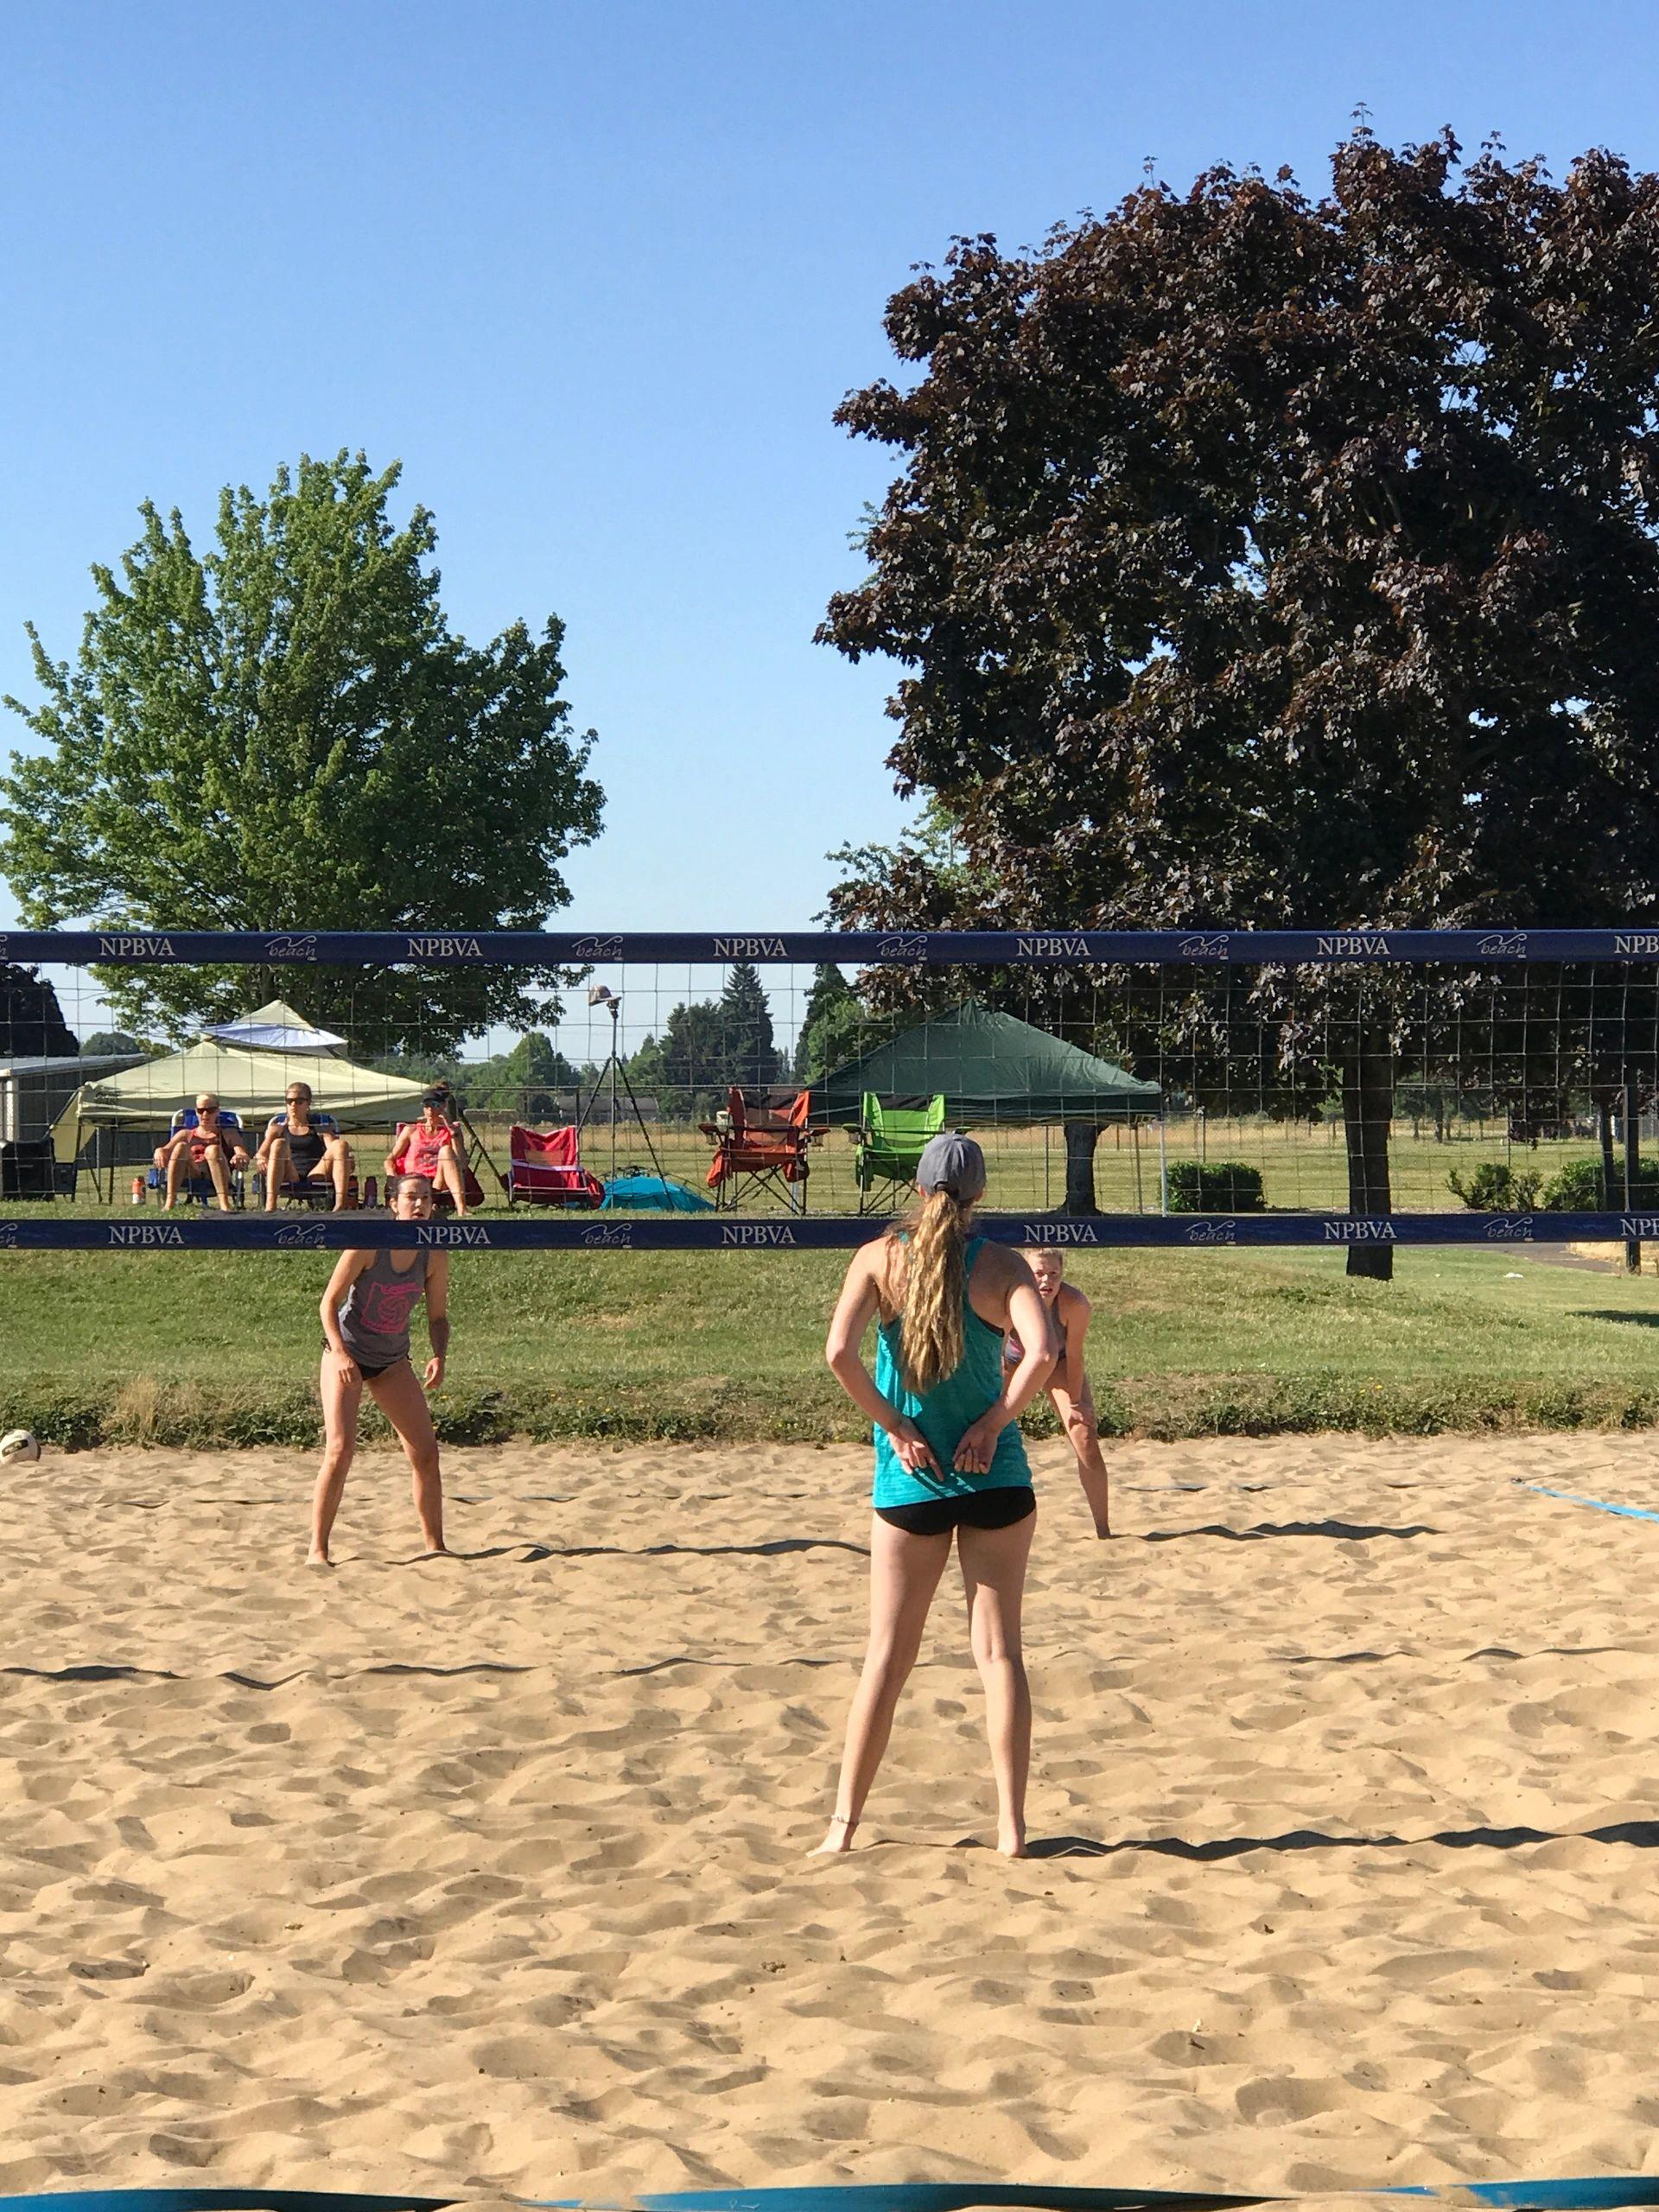 oregon beach volleyball sand volleyball beach volleyball